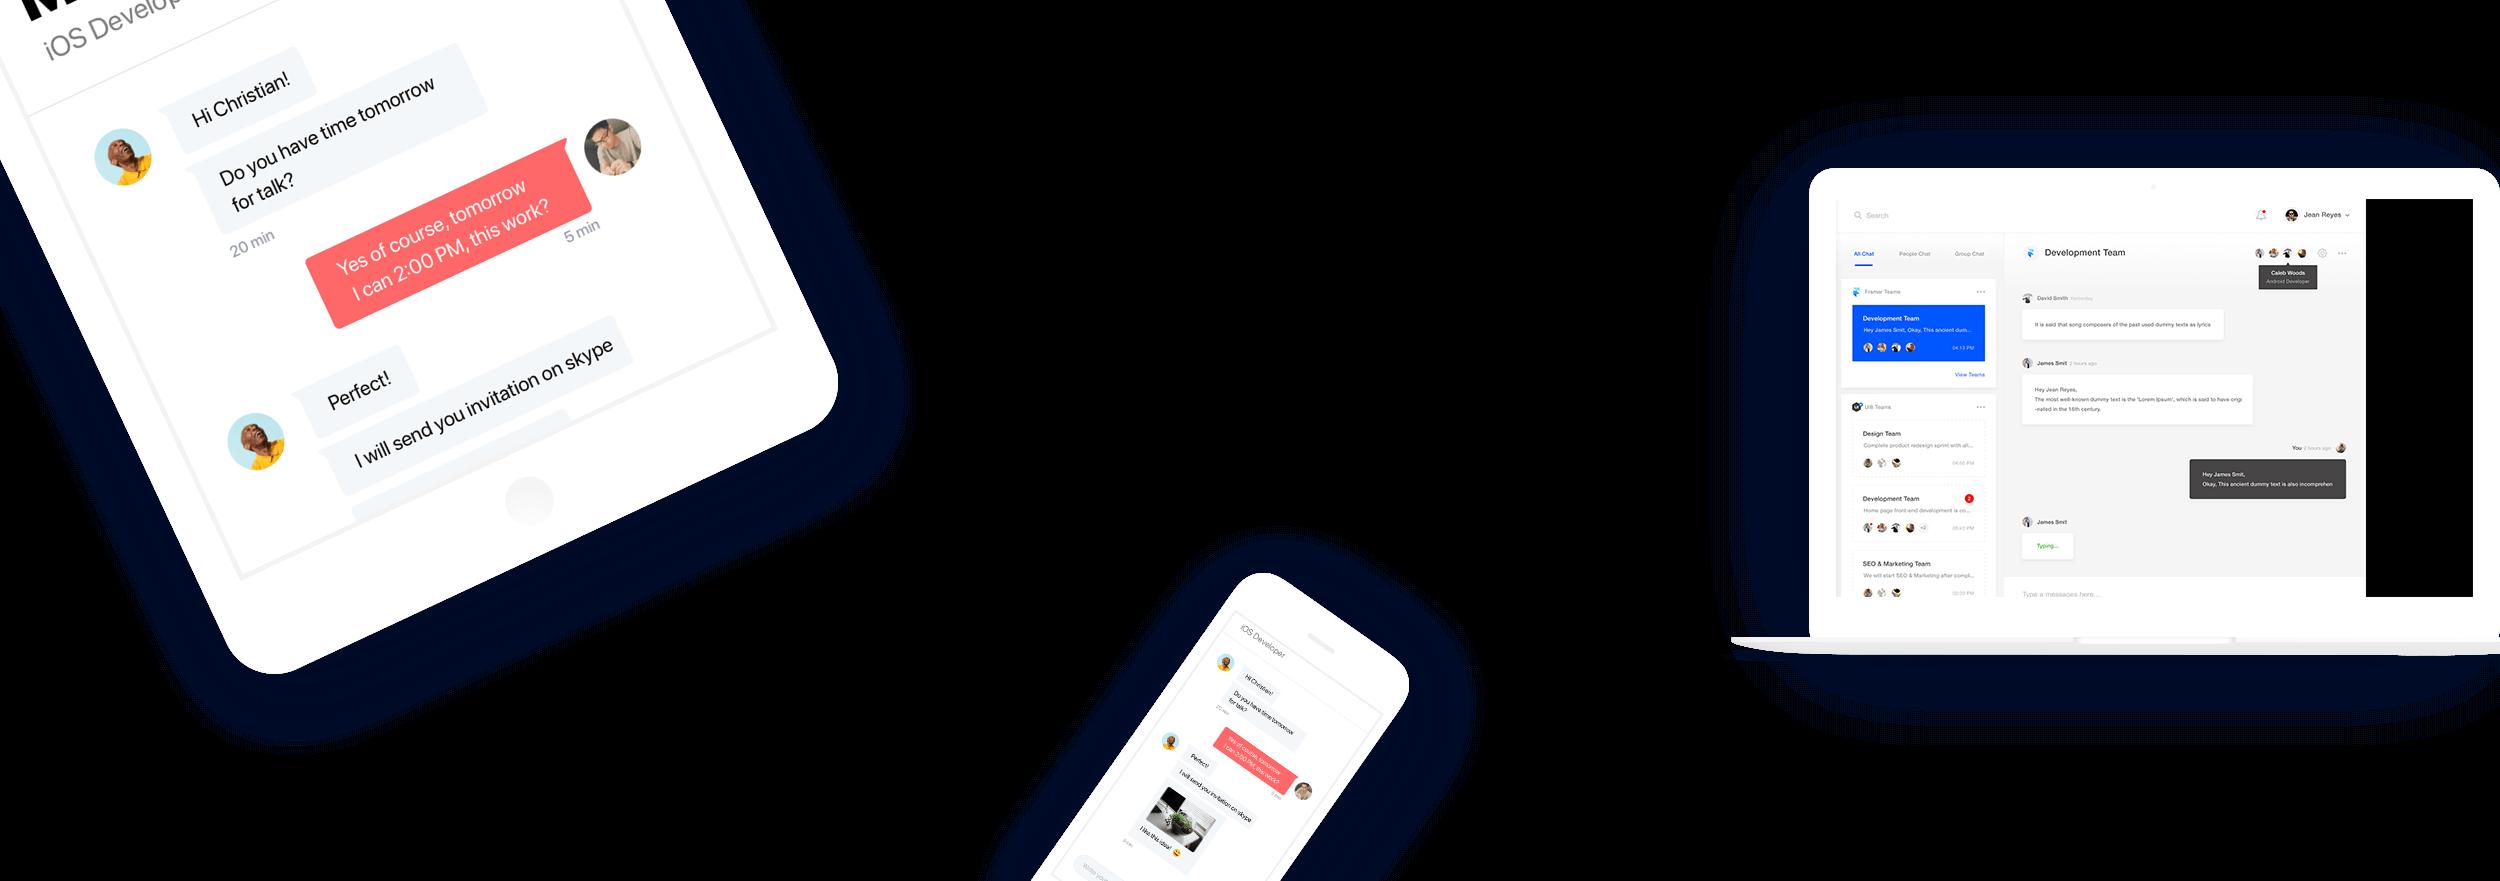 Device friendly widget